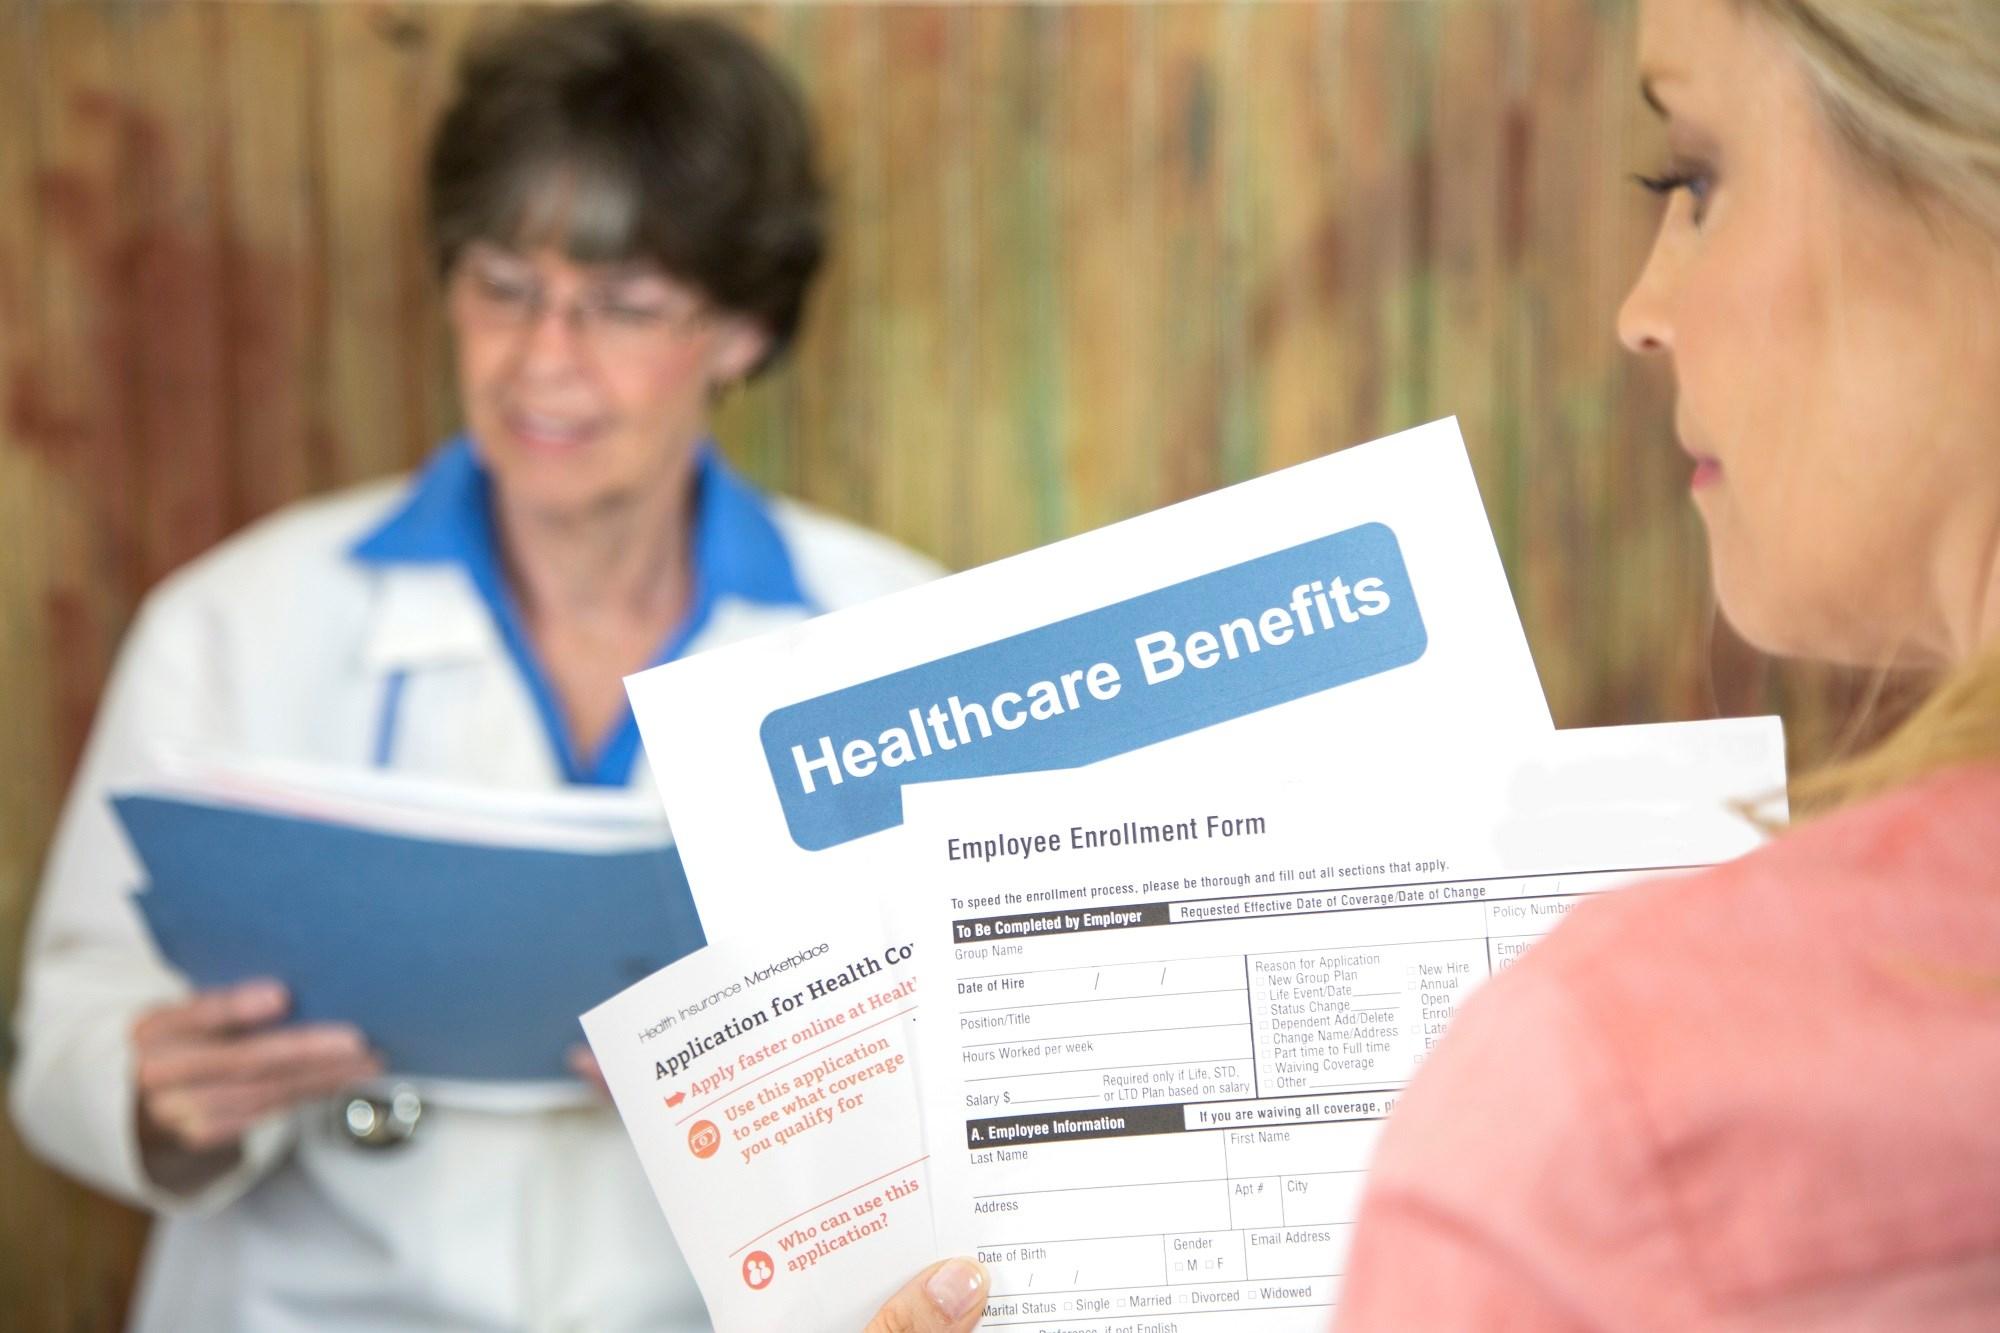 New Short-Term Health Plans Have Large Coverage Gaps